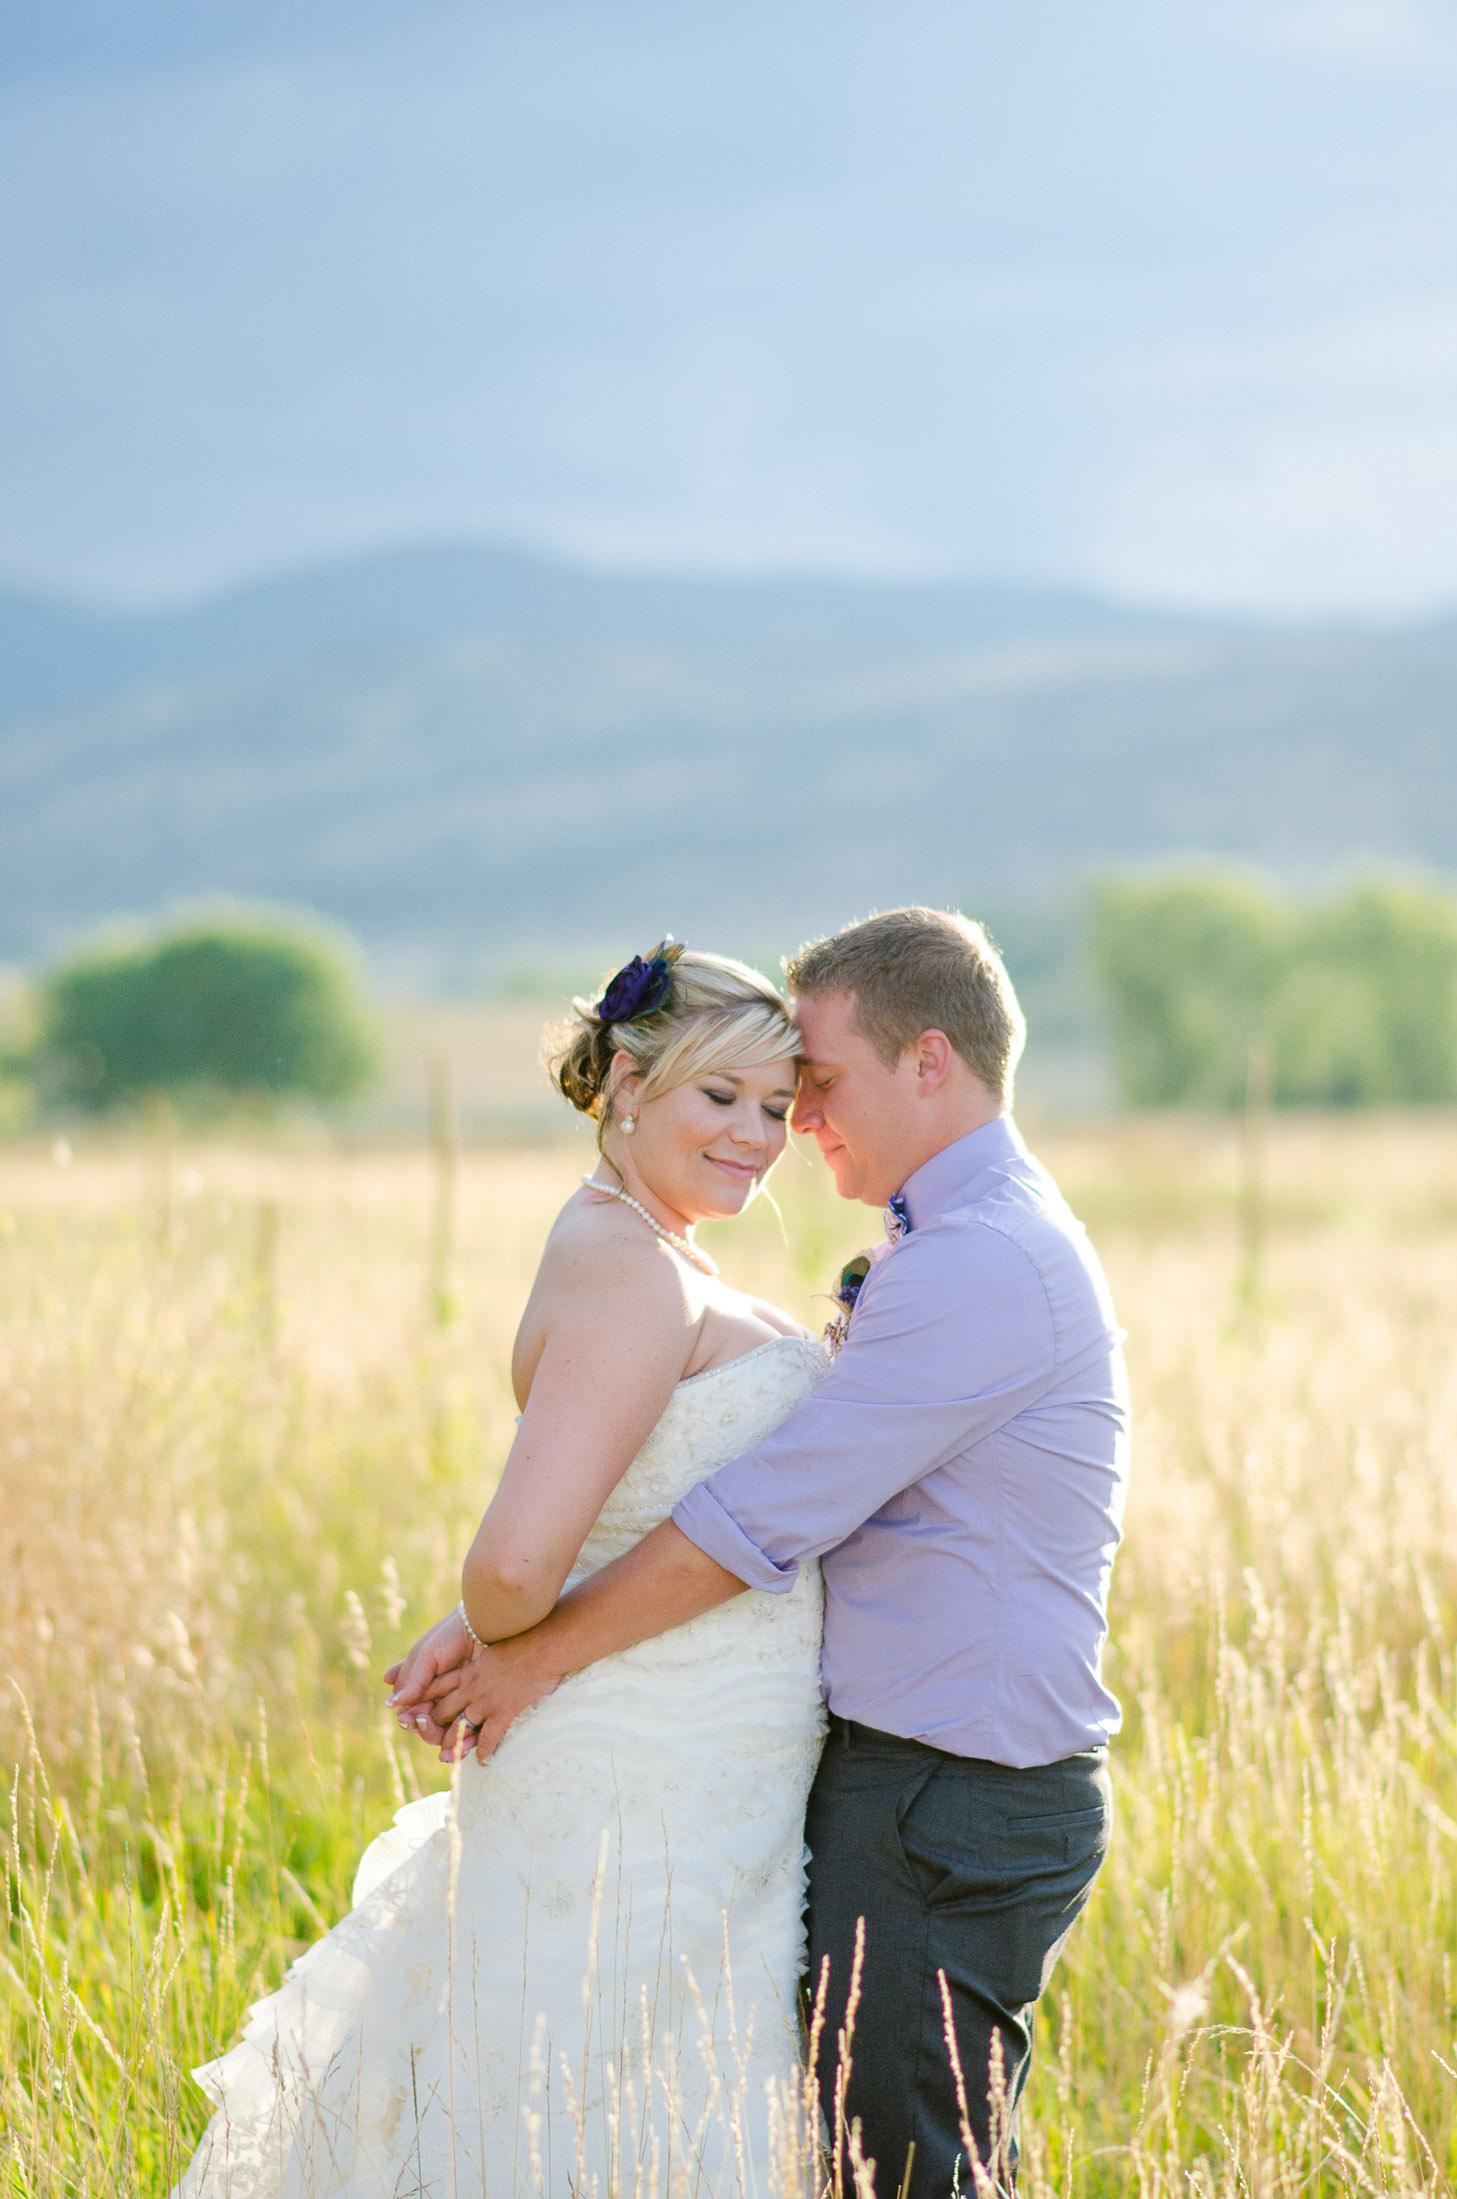 152elopement-photographer-colorado-shupe_homestead_wedding_jessica_andrew_2233.jpg